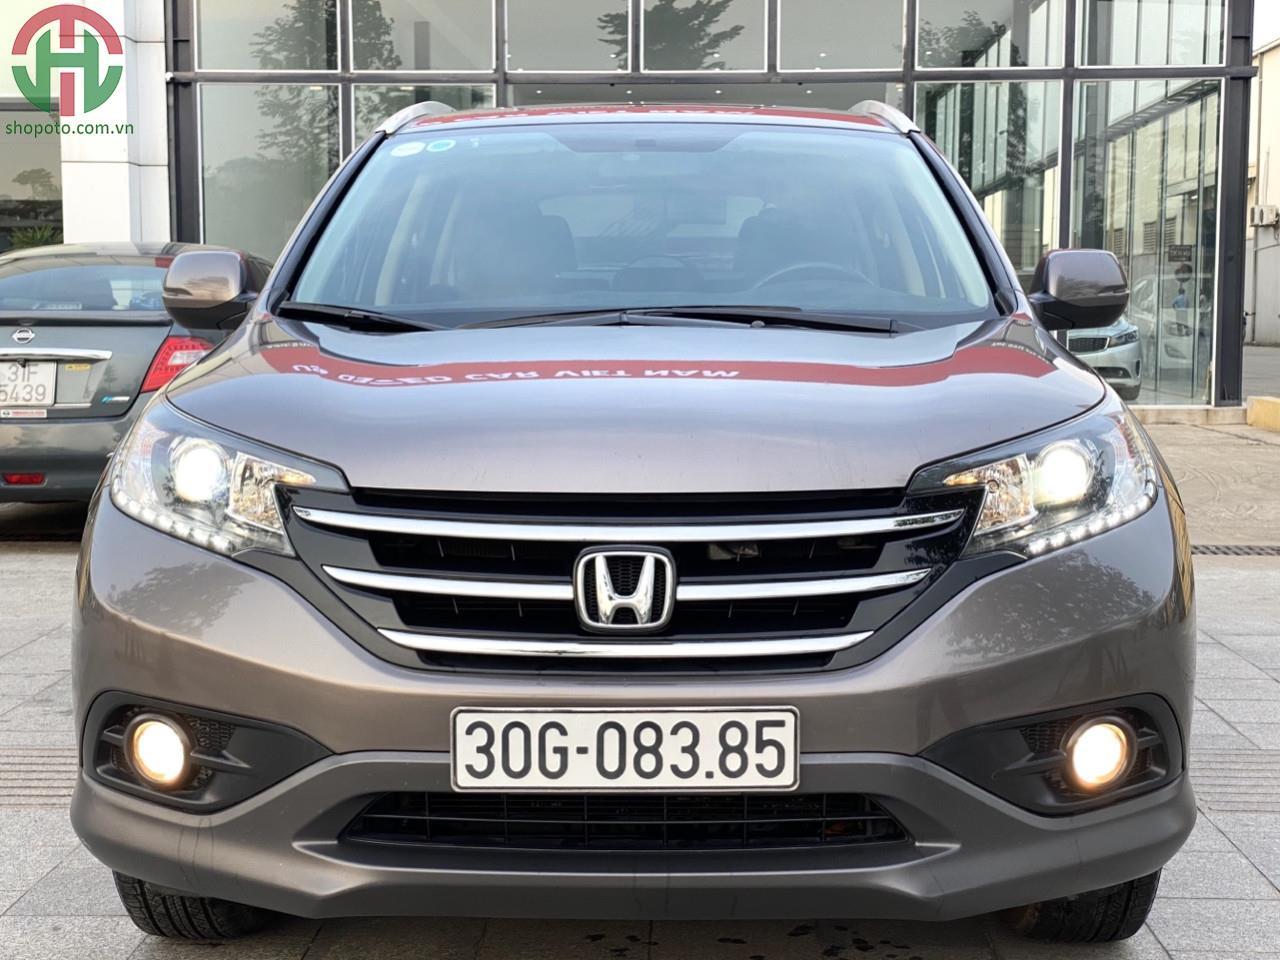 Honda CRV 2.4 AT 2013 màu Titan